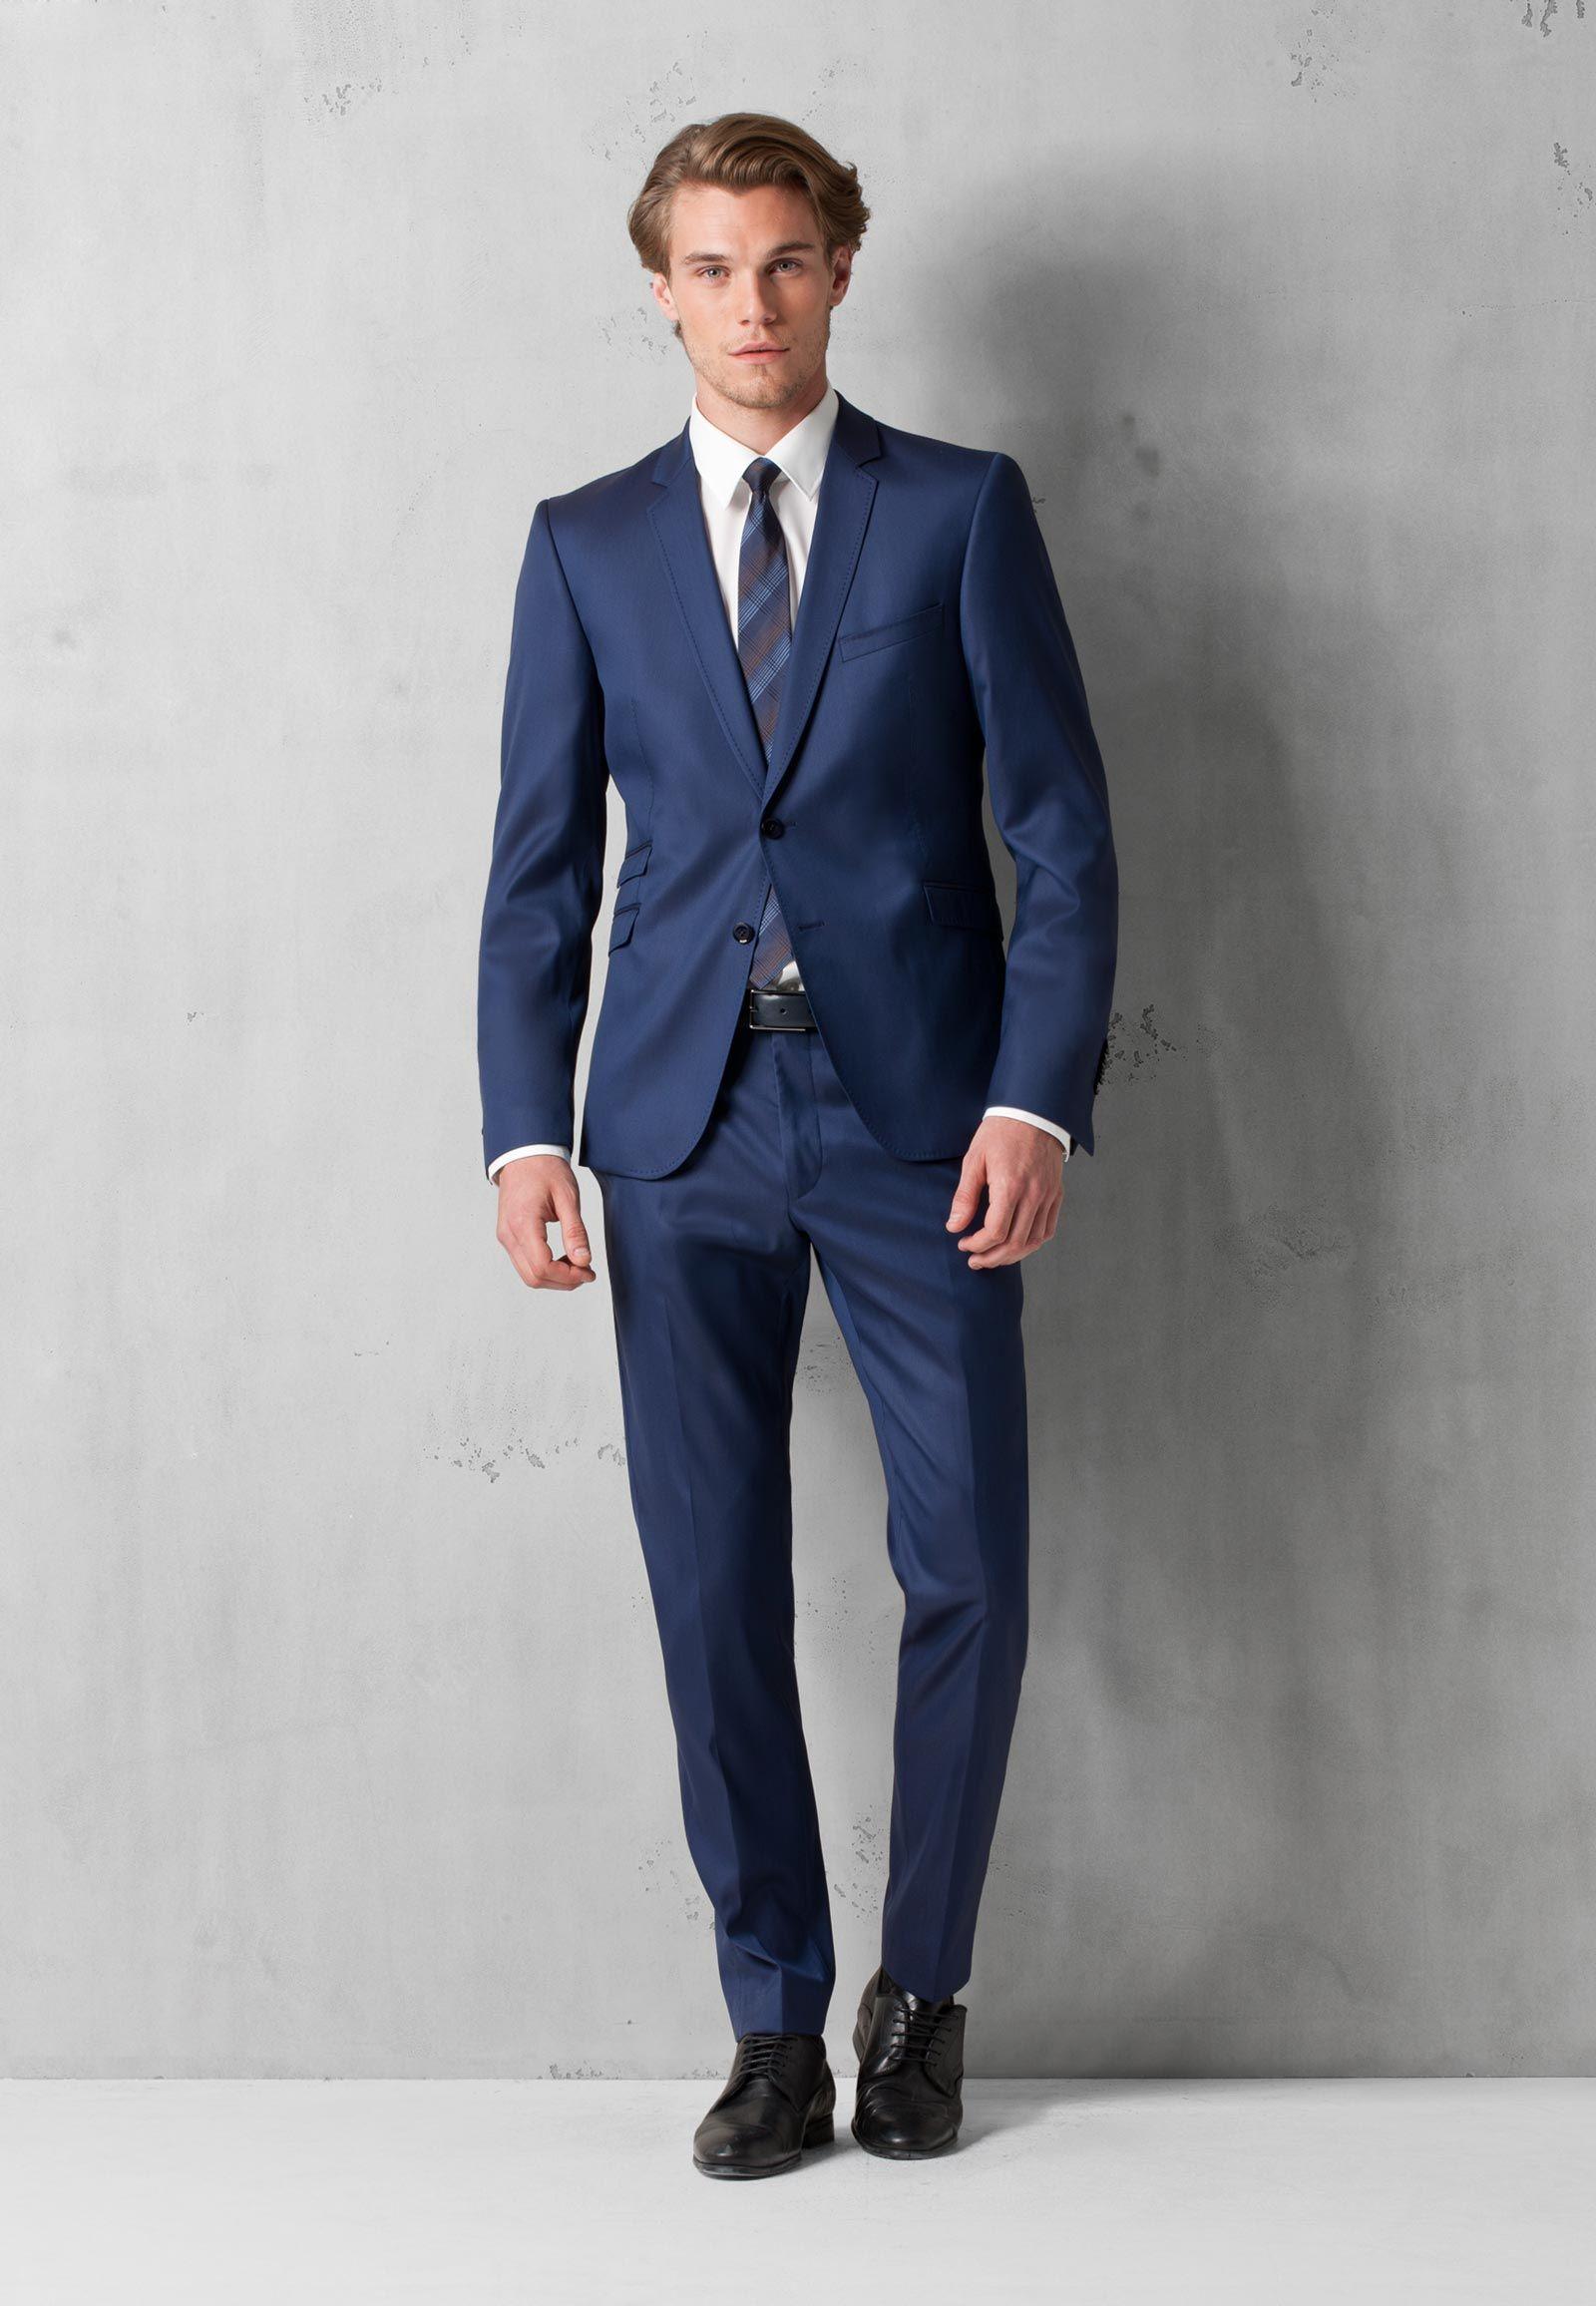 Anzug Vince-Madden, stahl-blau - im Strellson Online-Shop   Anzüge ... 4003fa32e6